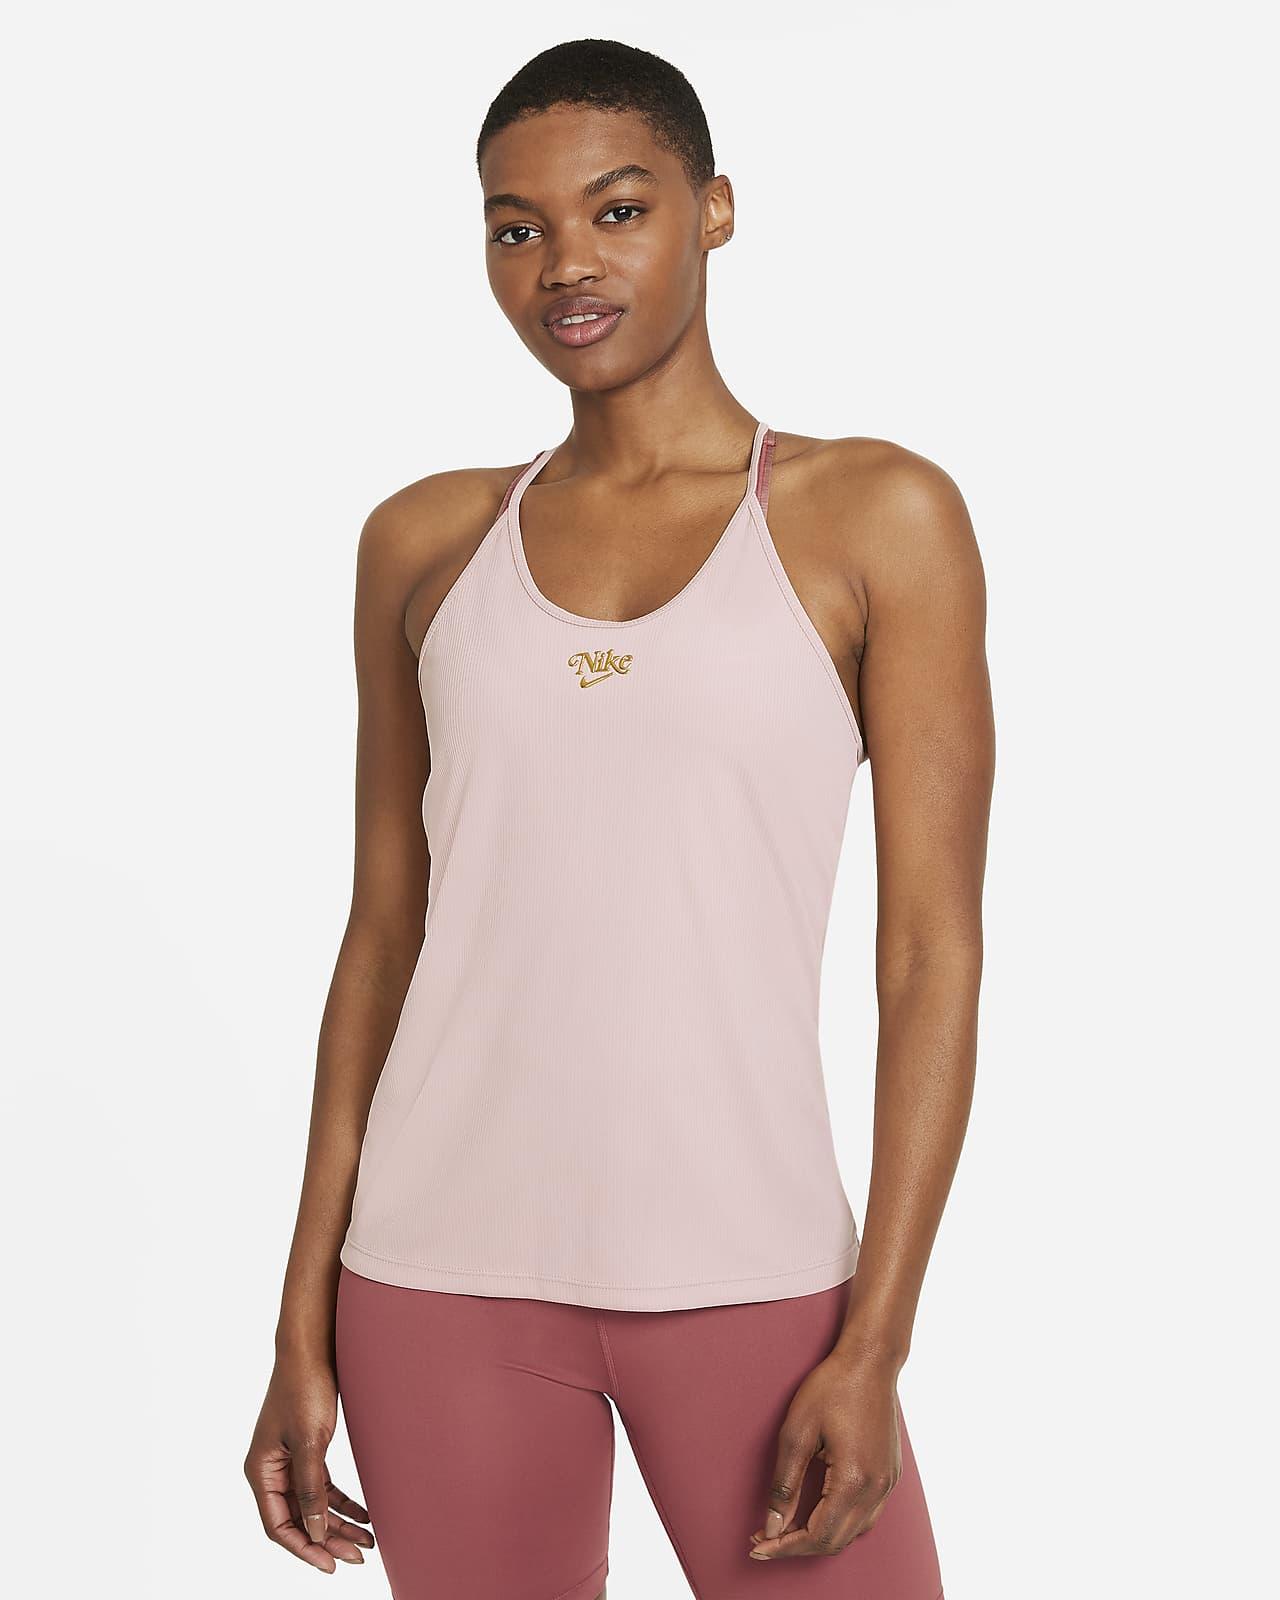 Nike Femme Elastika Women's Training Tank